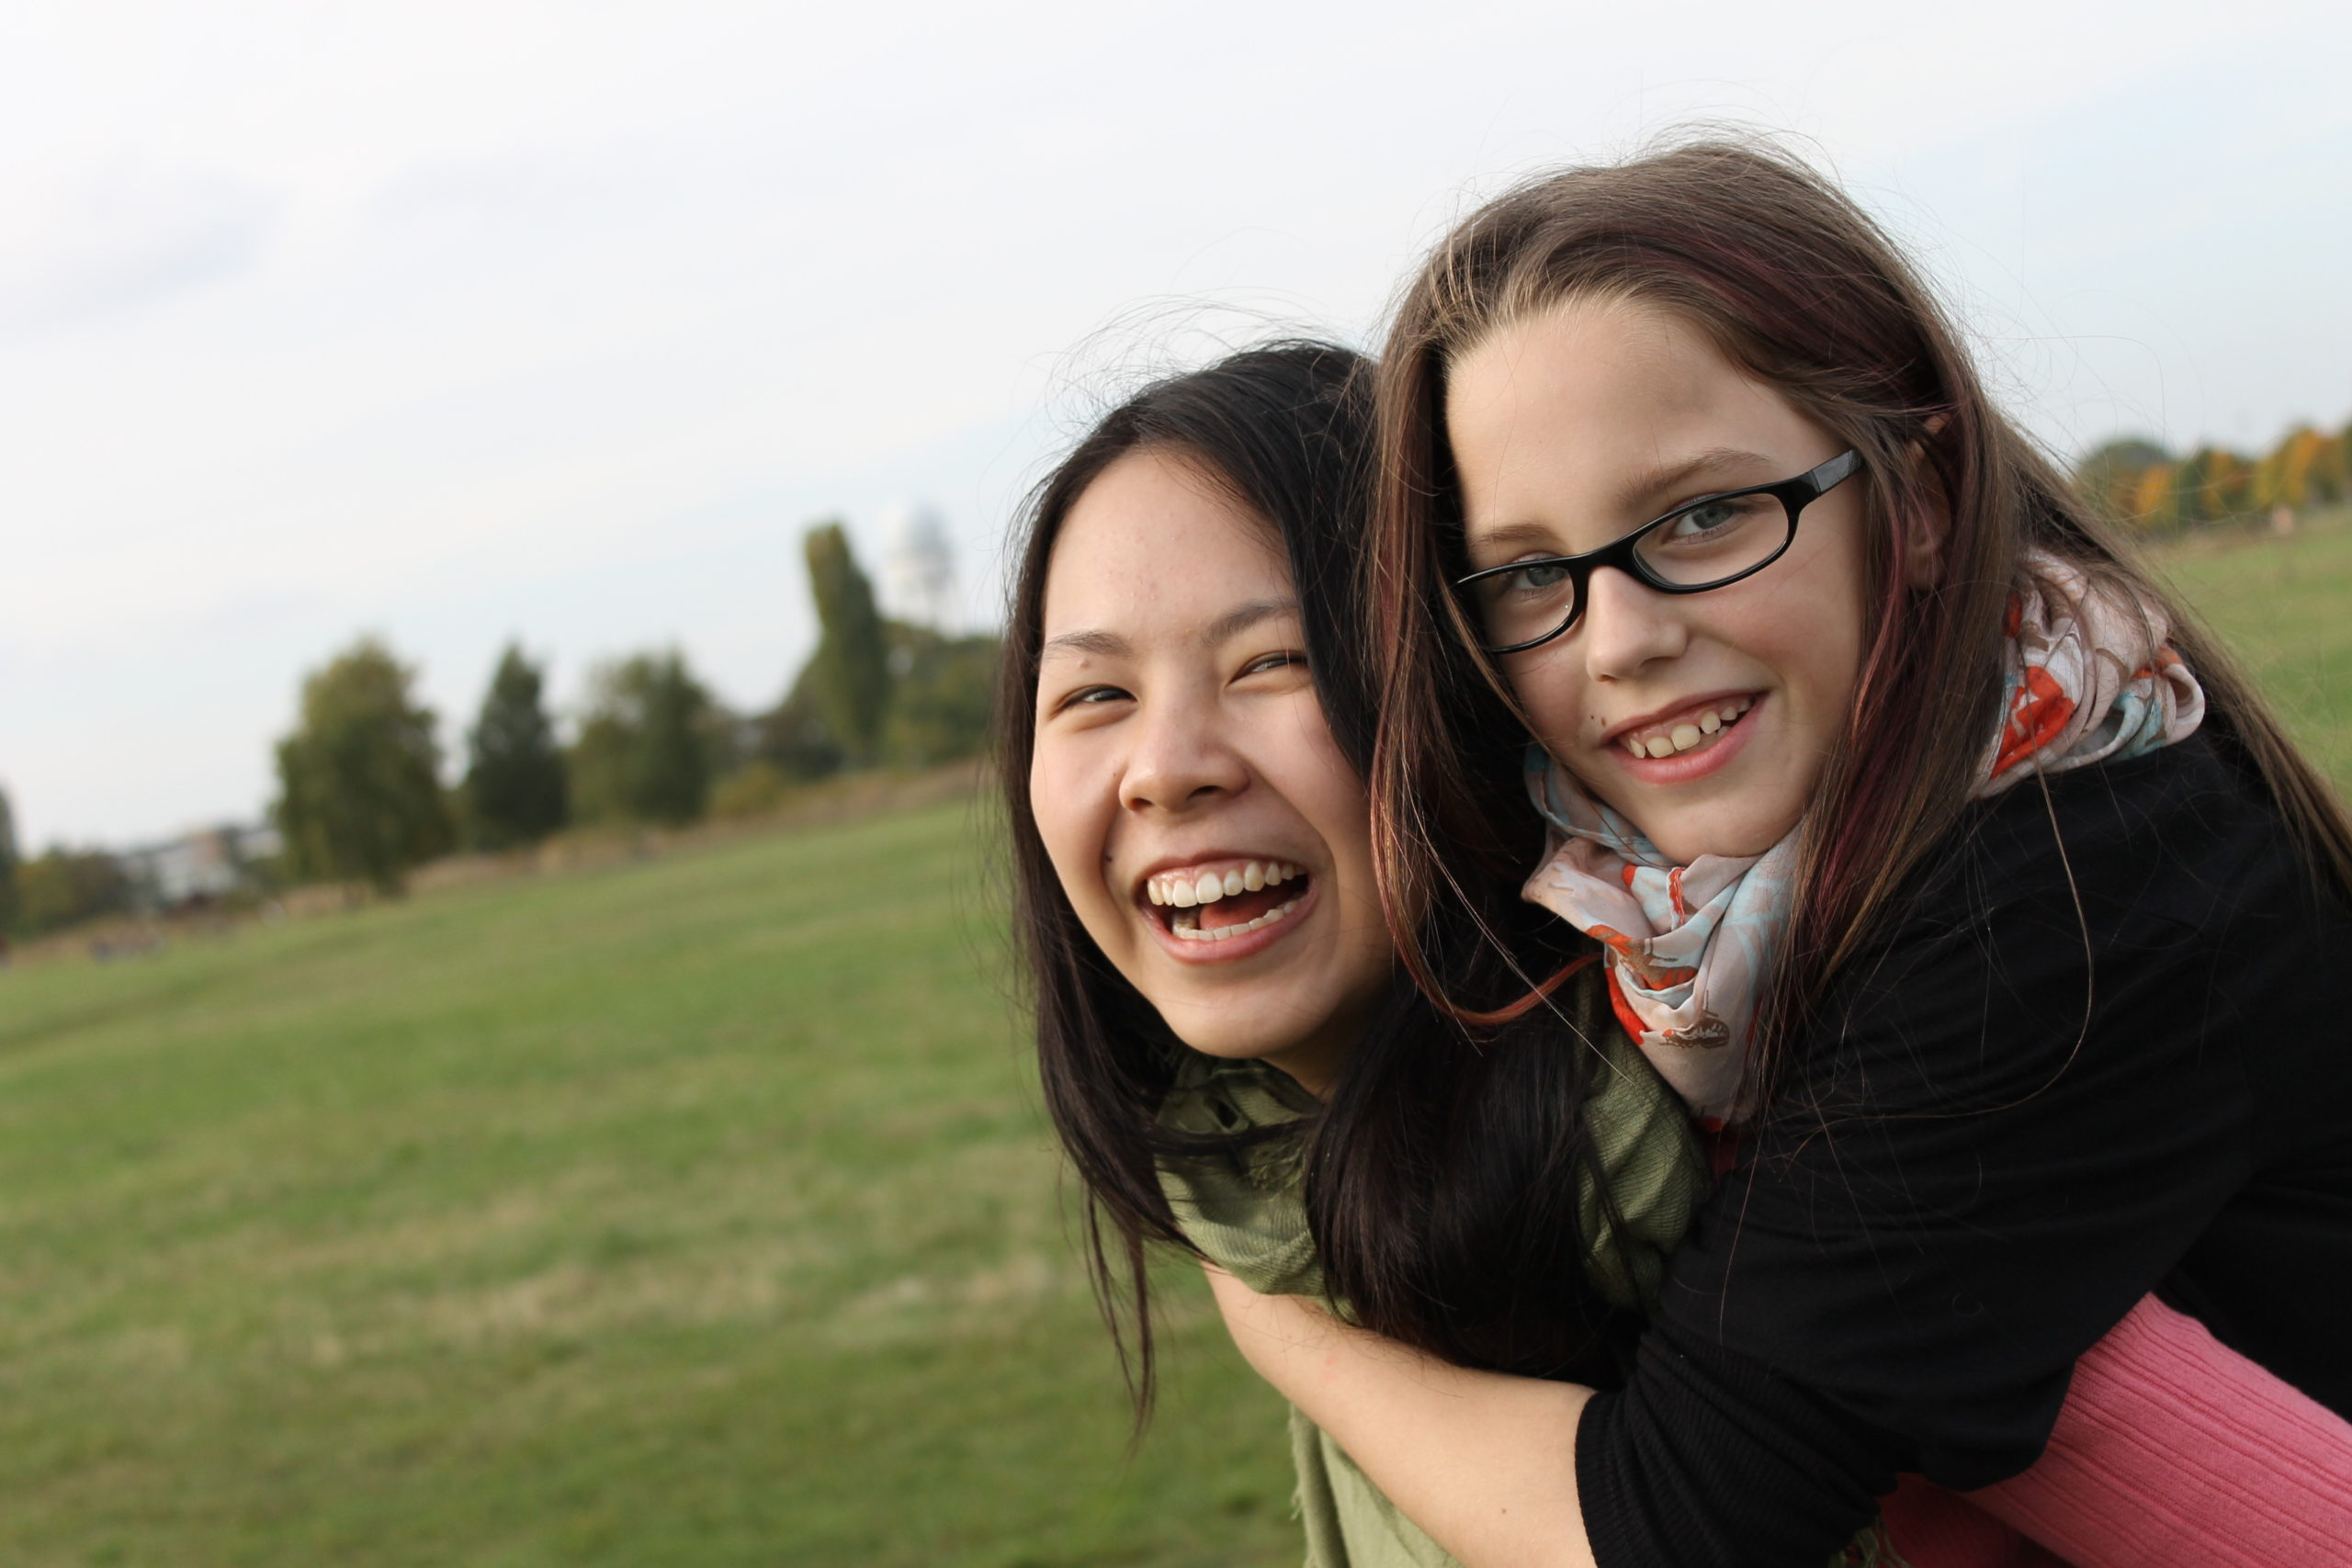 Paten-Tandem auf dem Tempelhofer Feld lacht in die Kamera